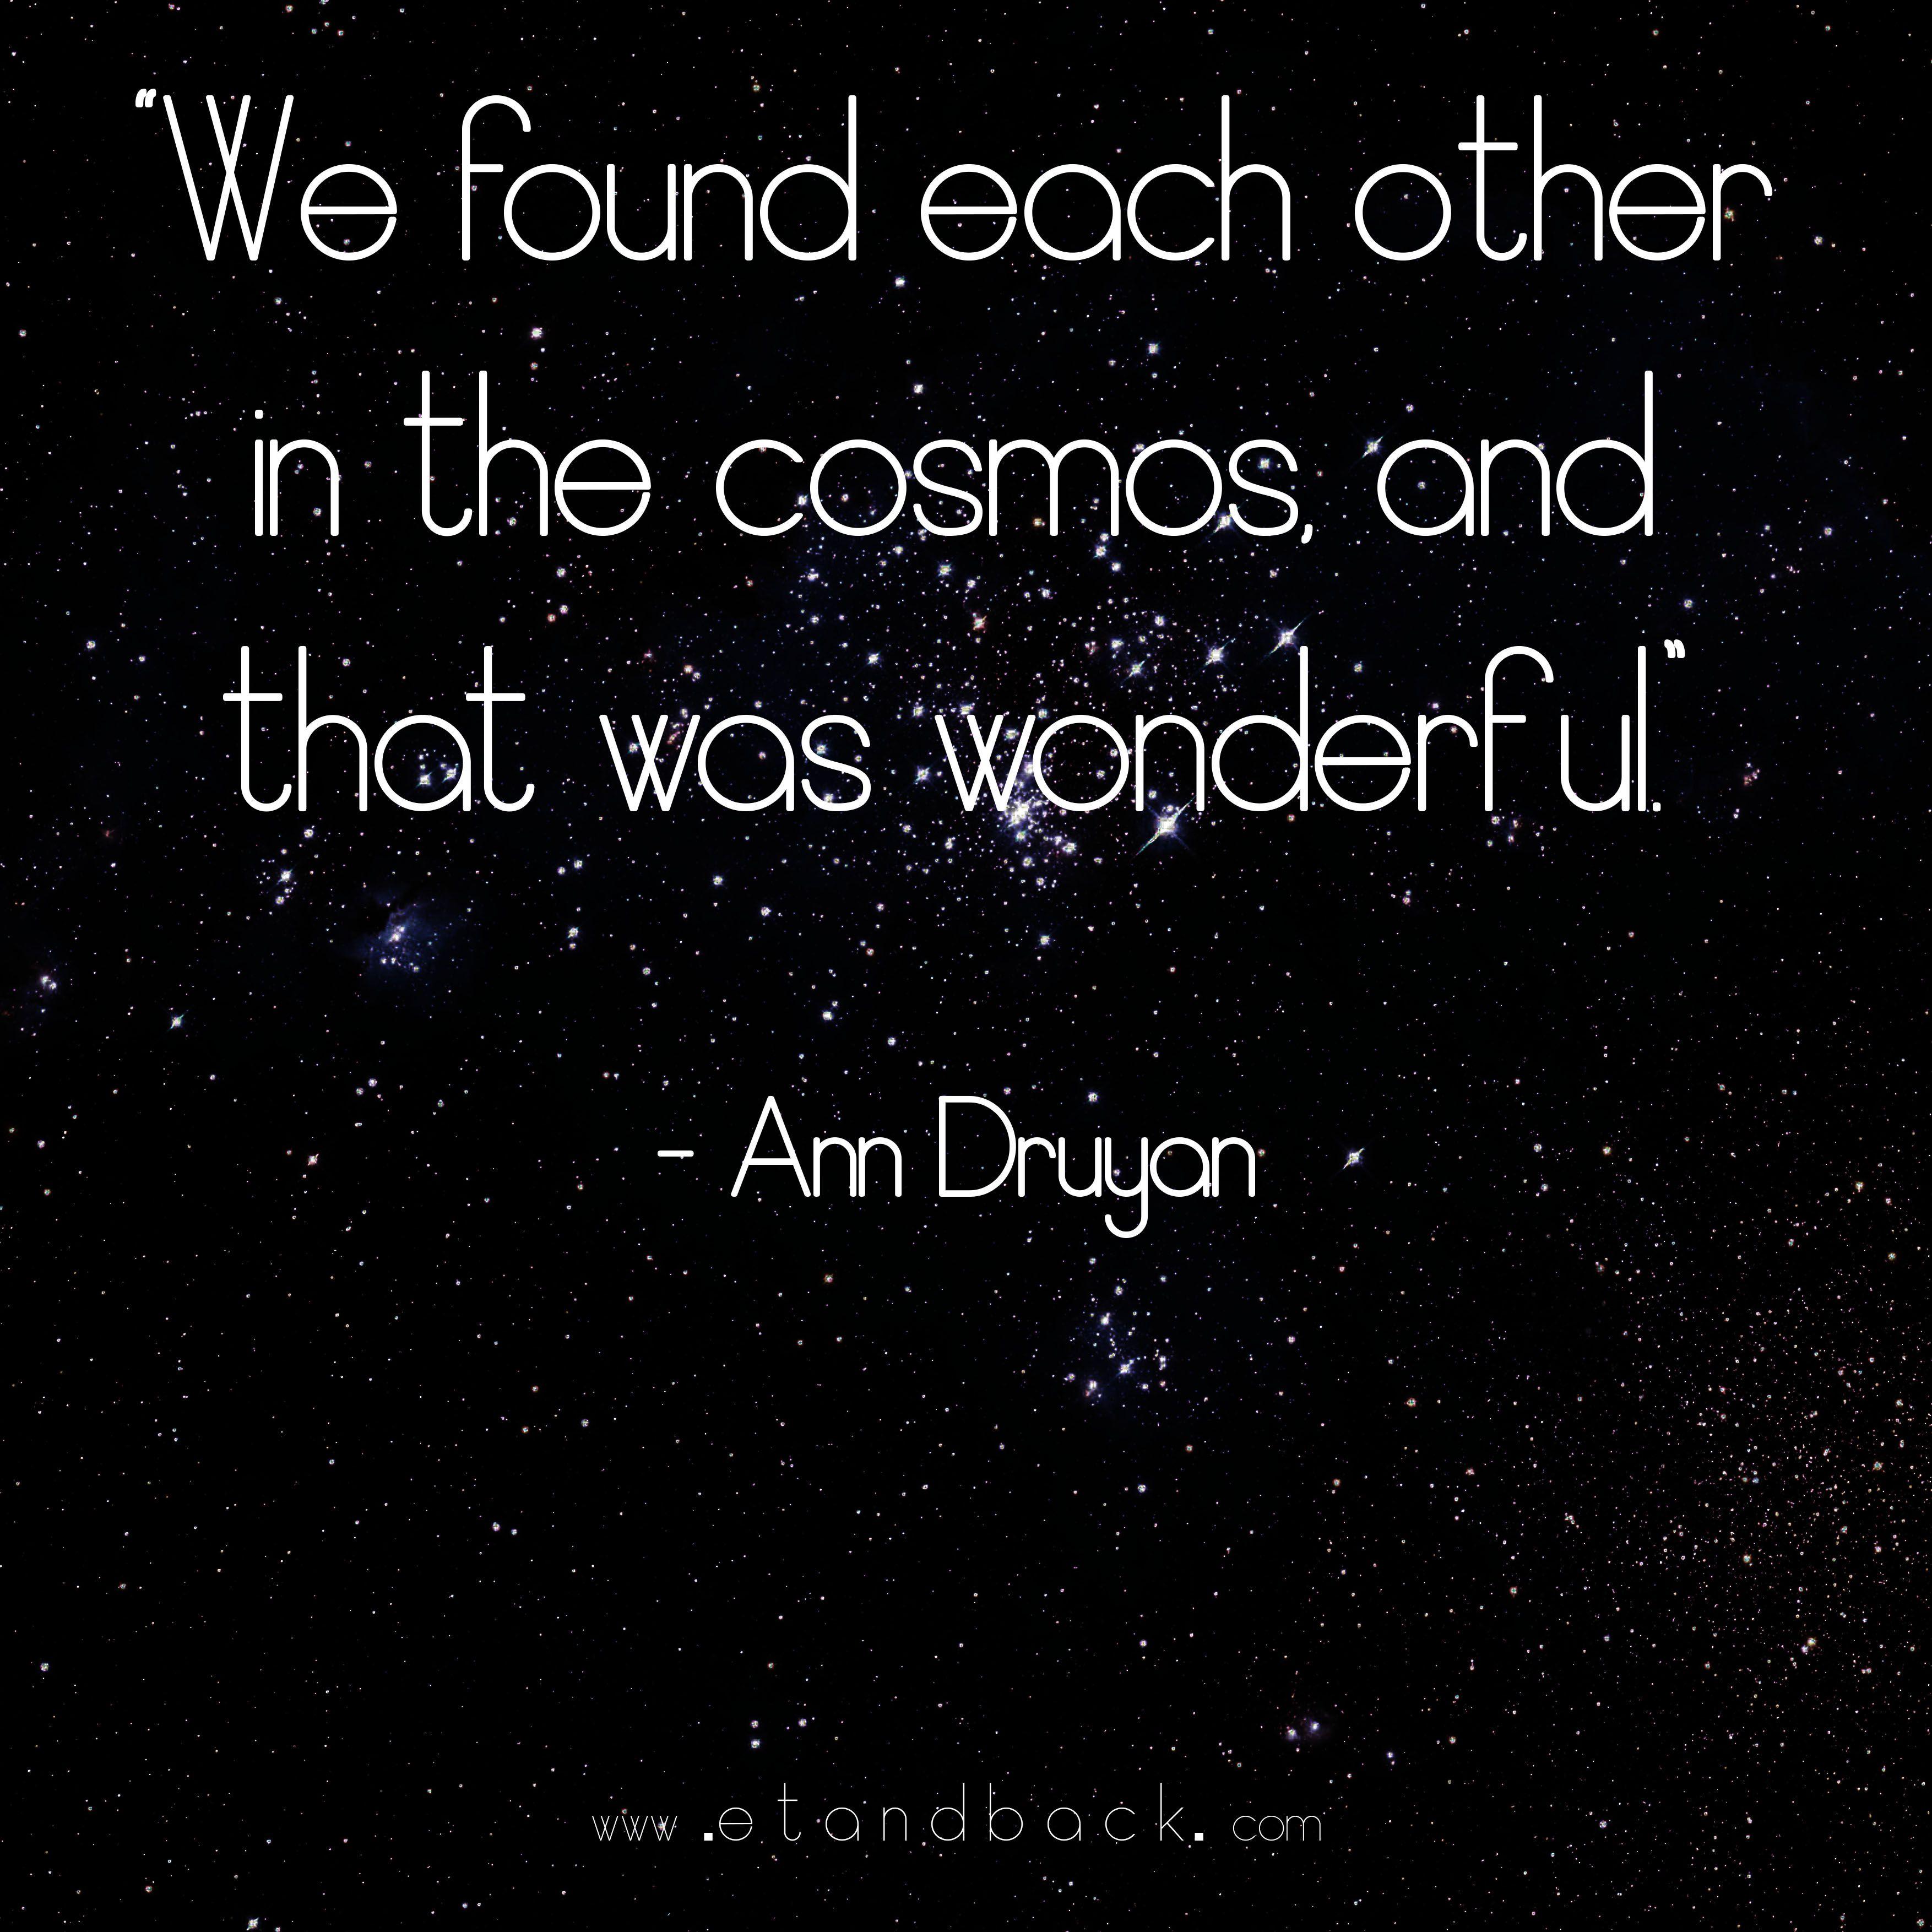 Ann Druyan Wife Of Carl Sagan Like Quotes Inspirational